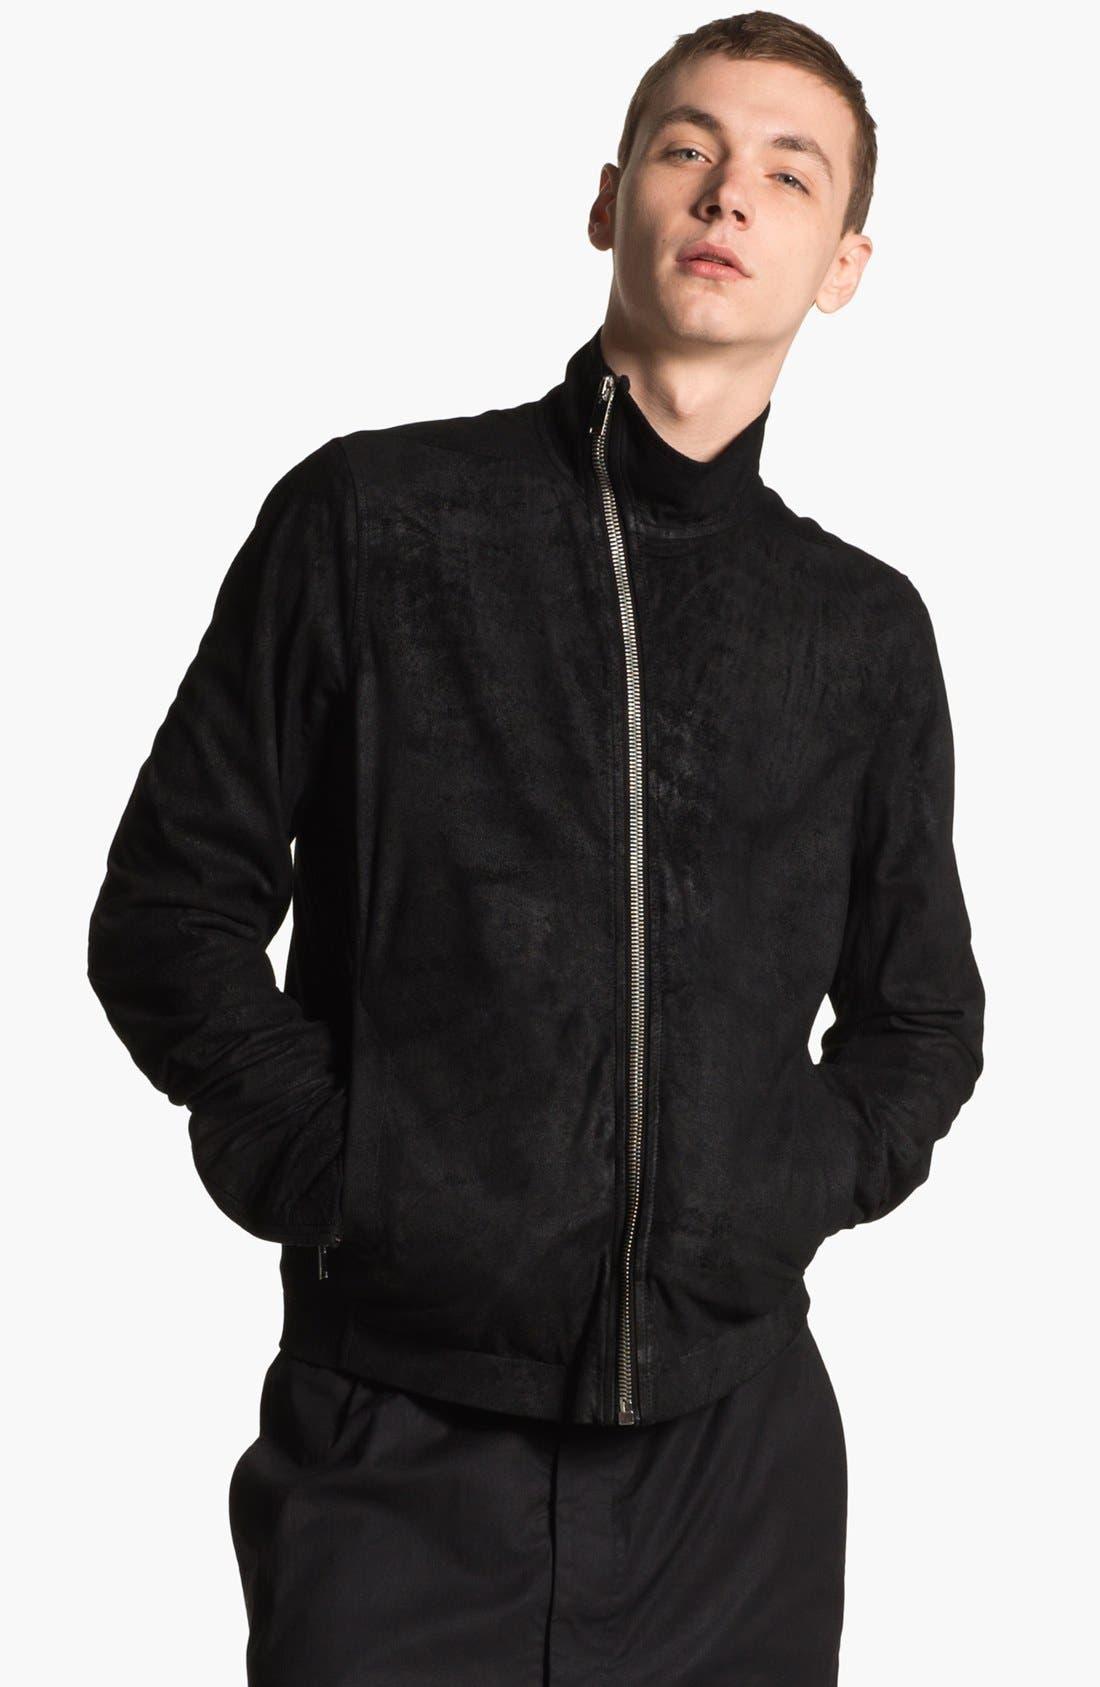 Alternate Image 1 Selected - Rick Owens 'Mollino' Lambskin Leather Jacket